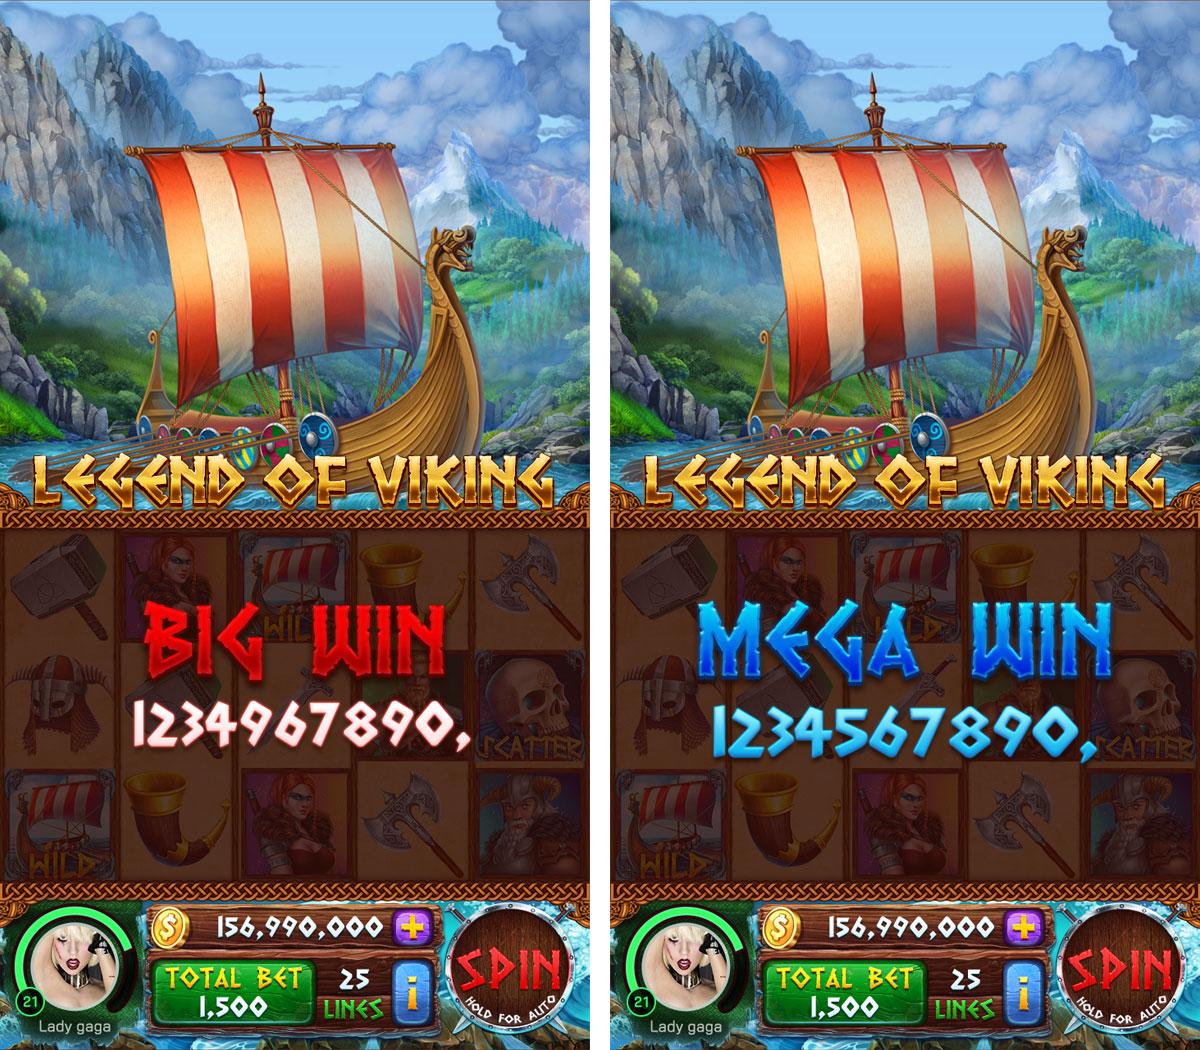 legend_of_viking_blog_bigwin_megawin